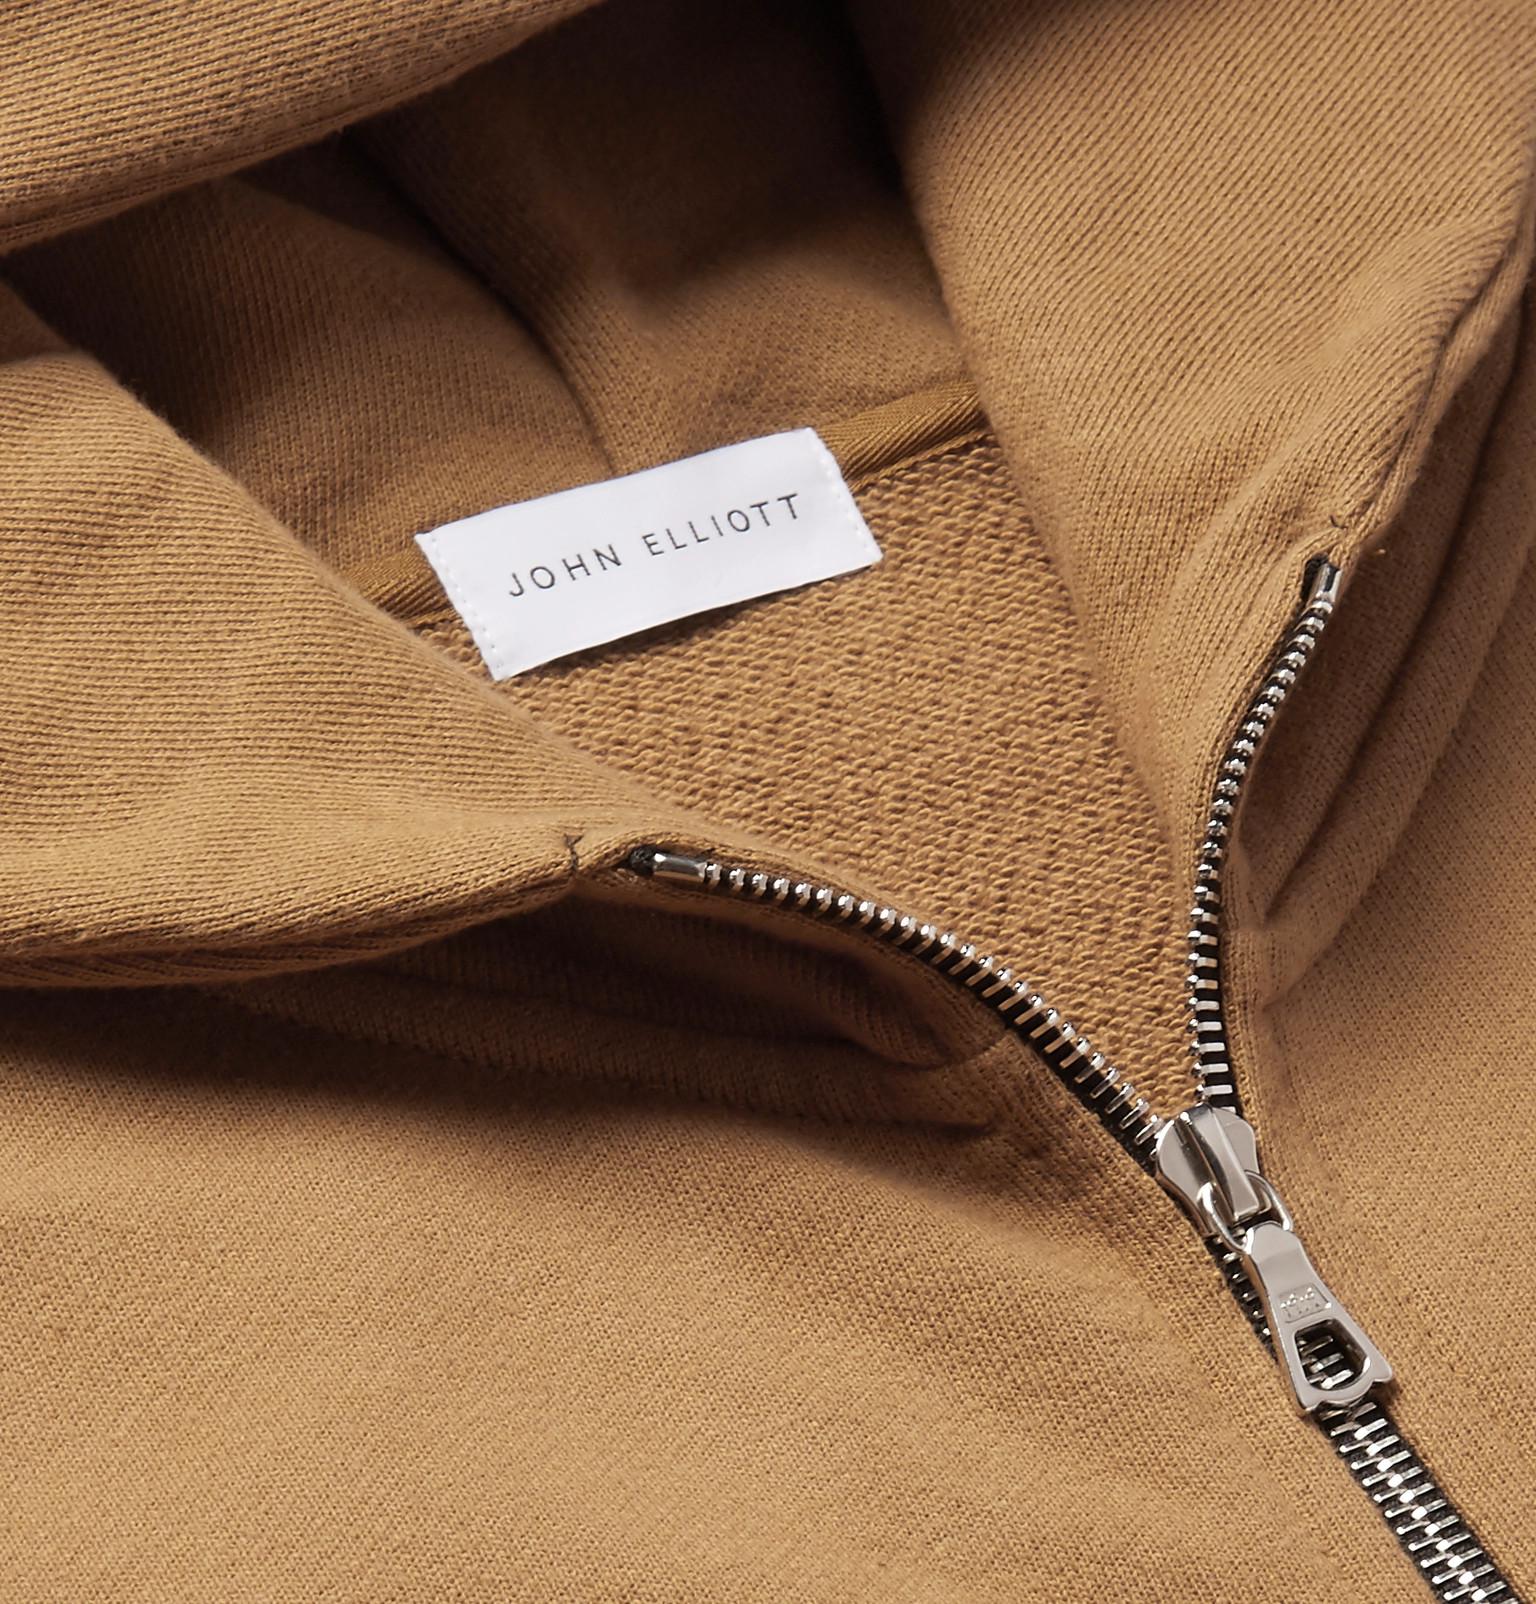 Cotton Jersey Elliottflash Loopback Hoodie Zip John Dual Up fwTqxBxC